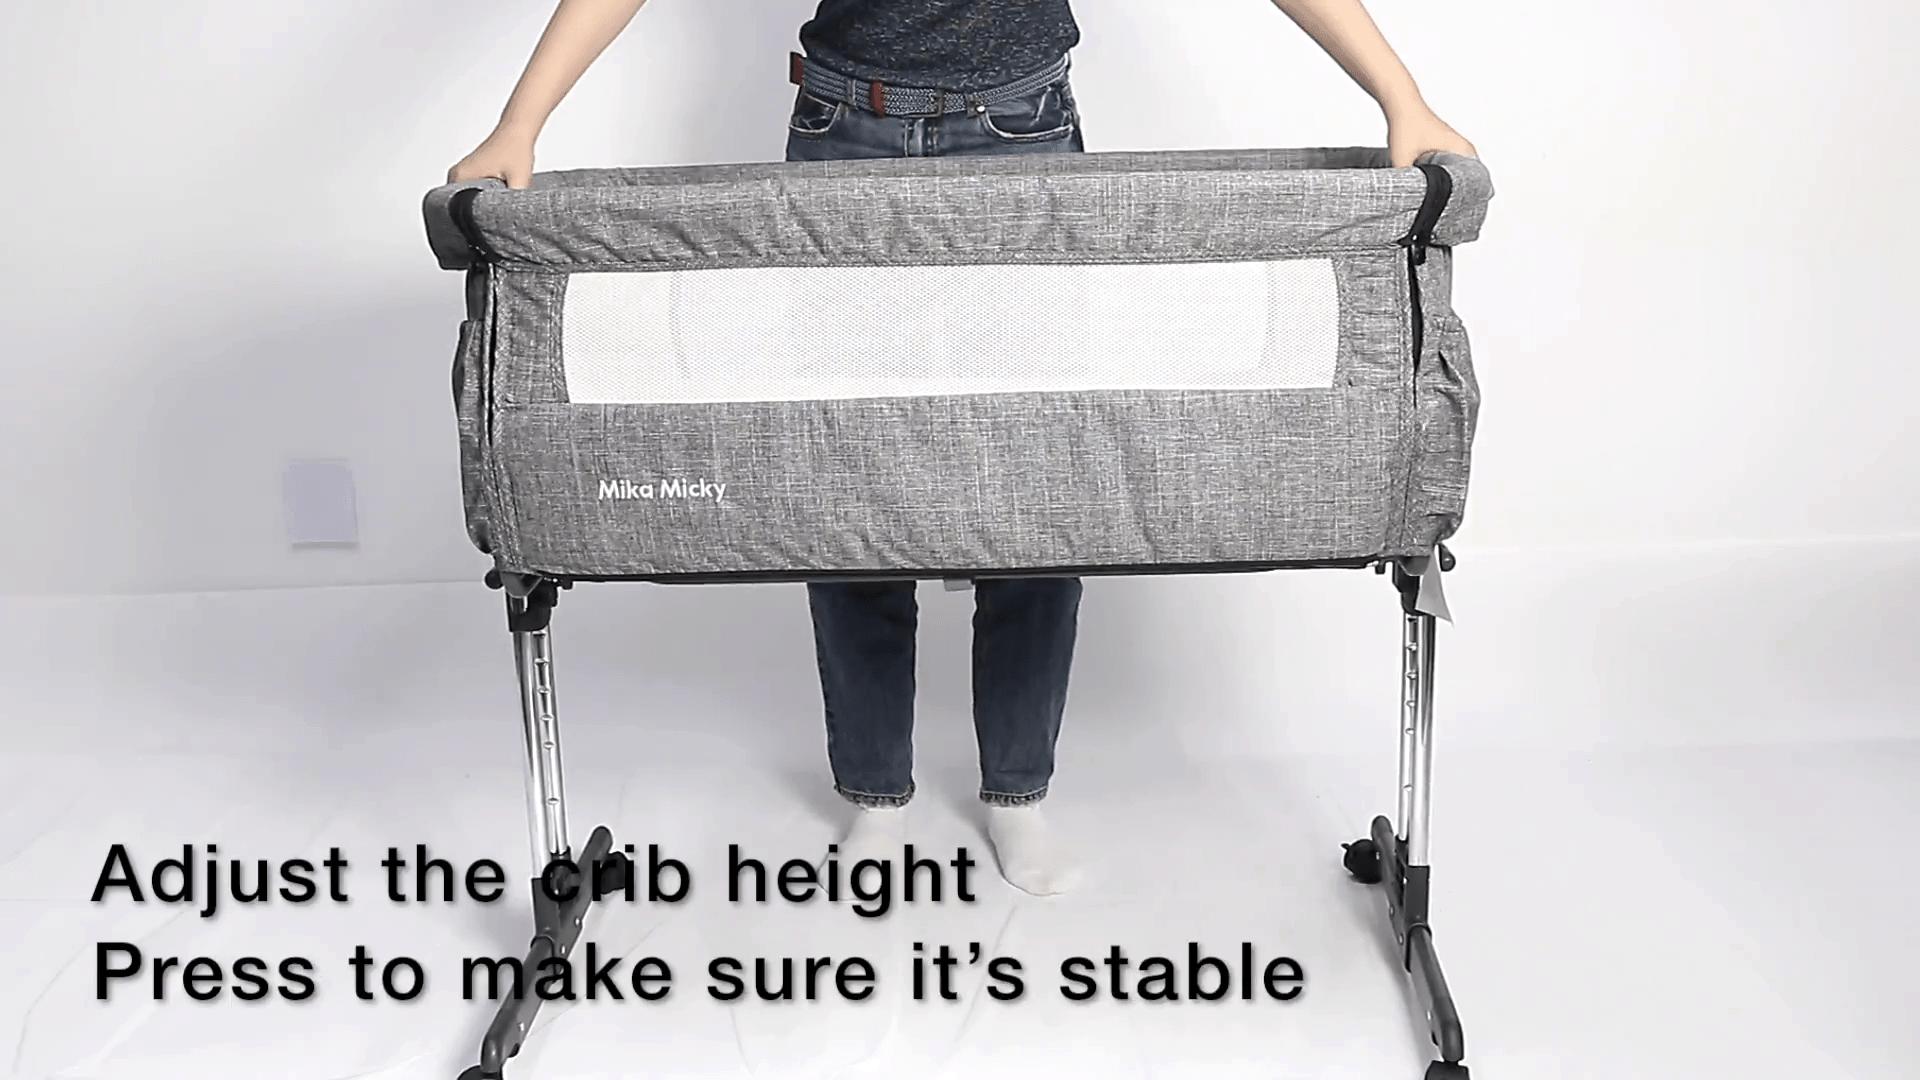 Mika Micky - adjust the height